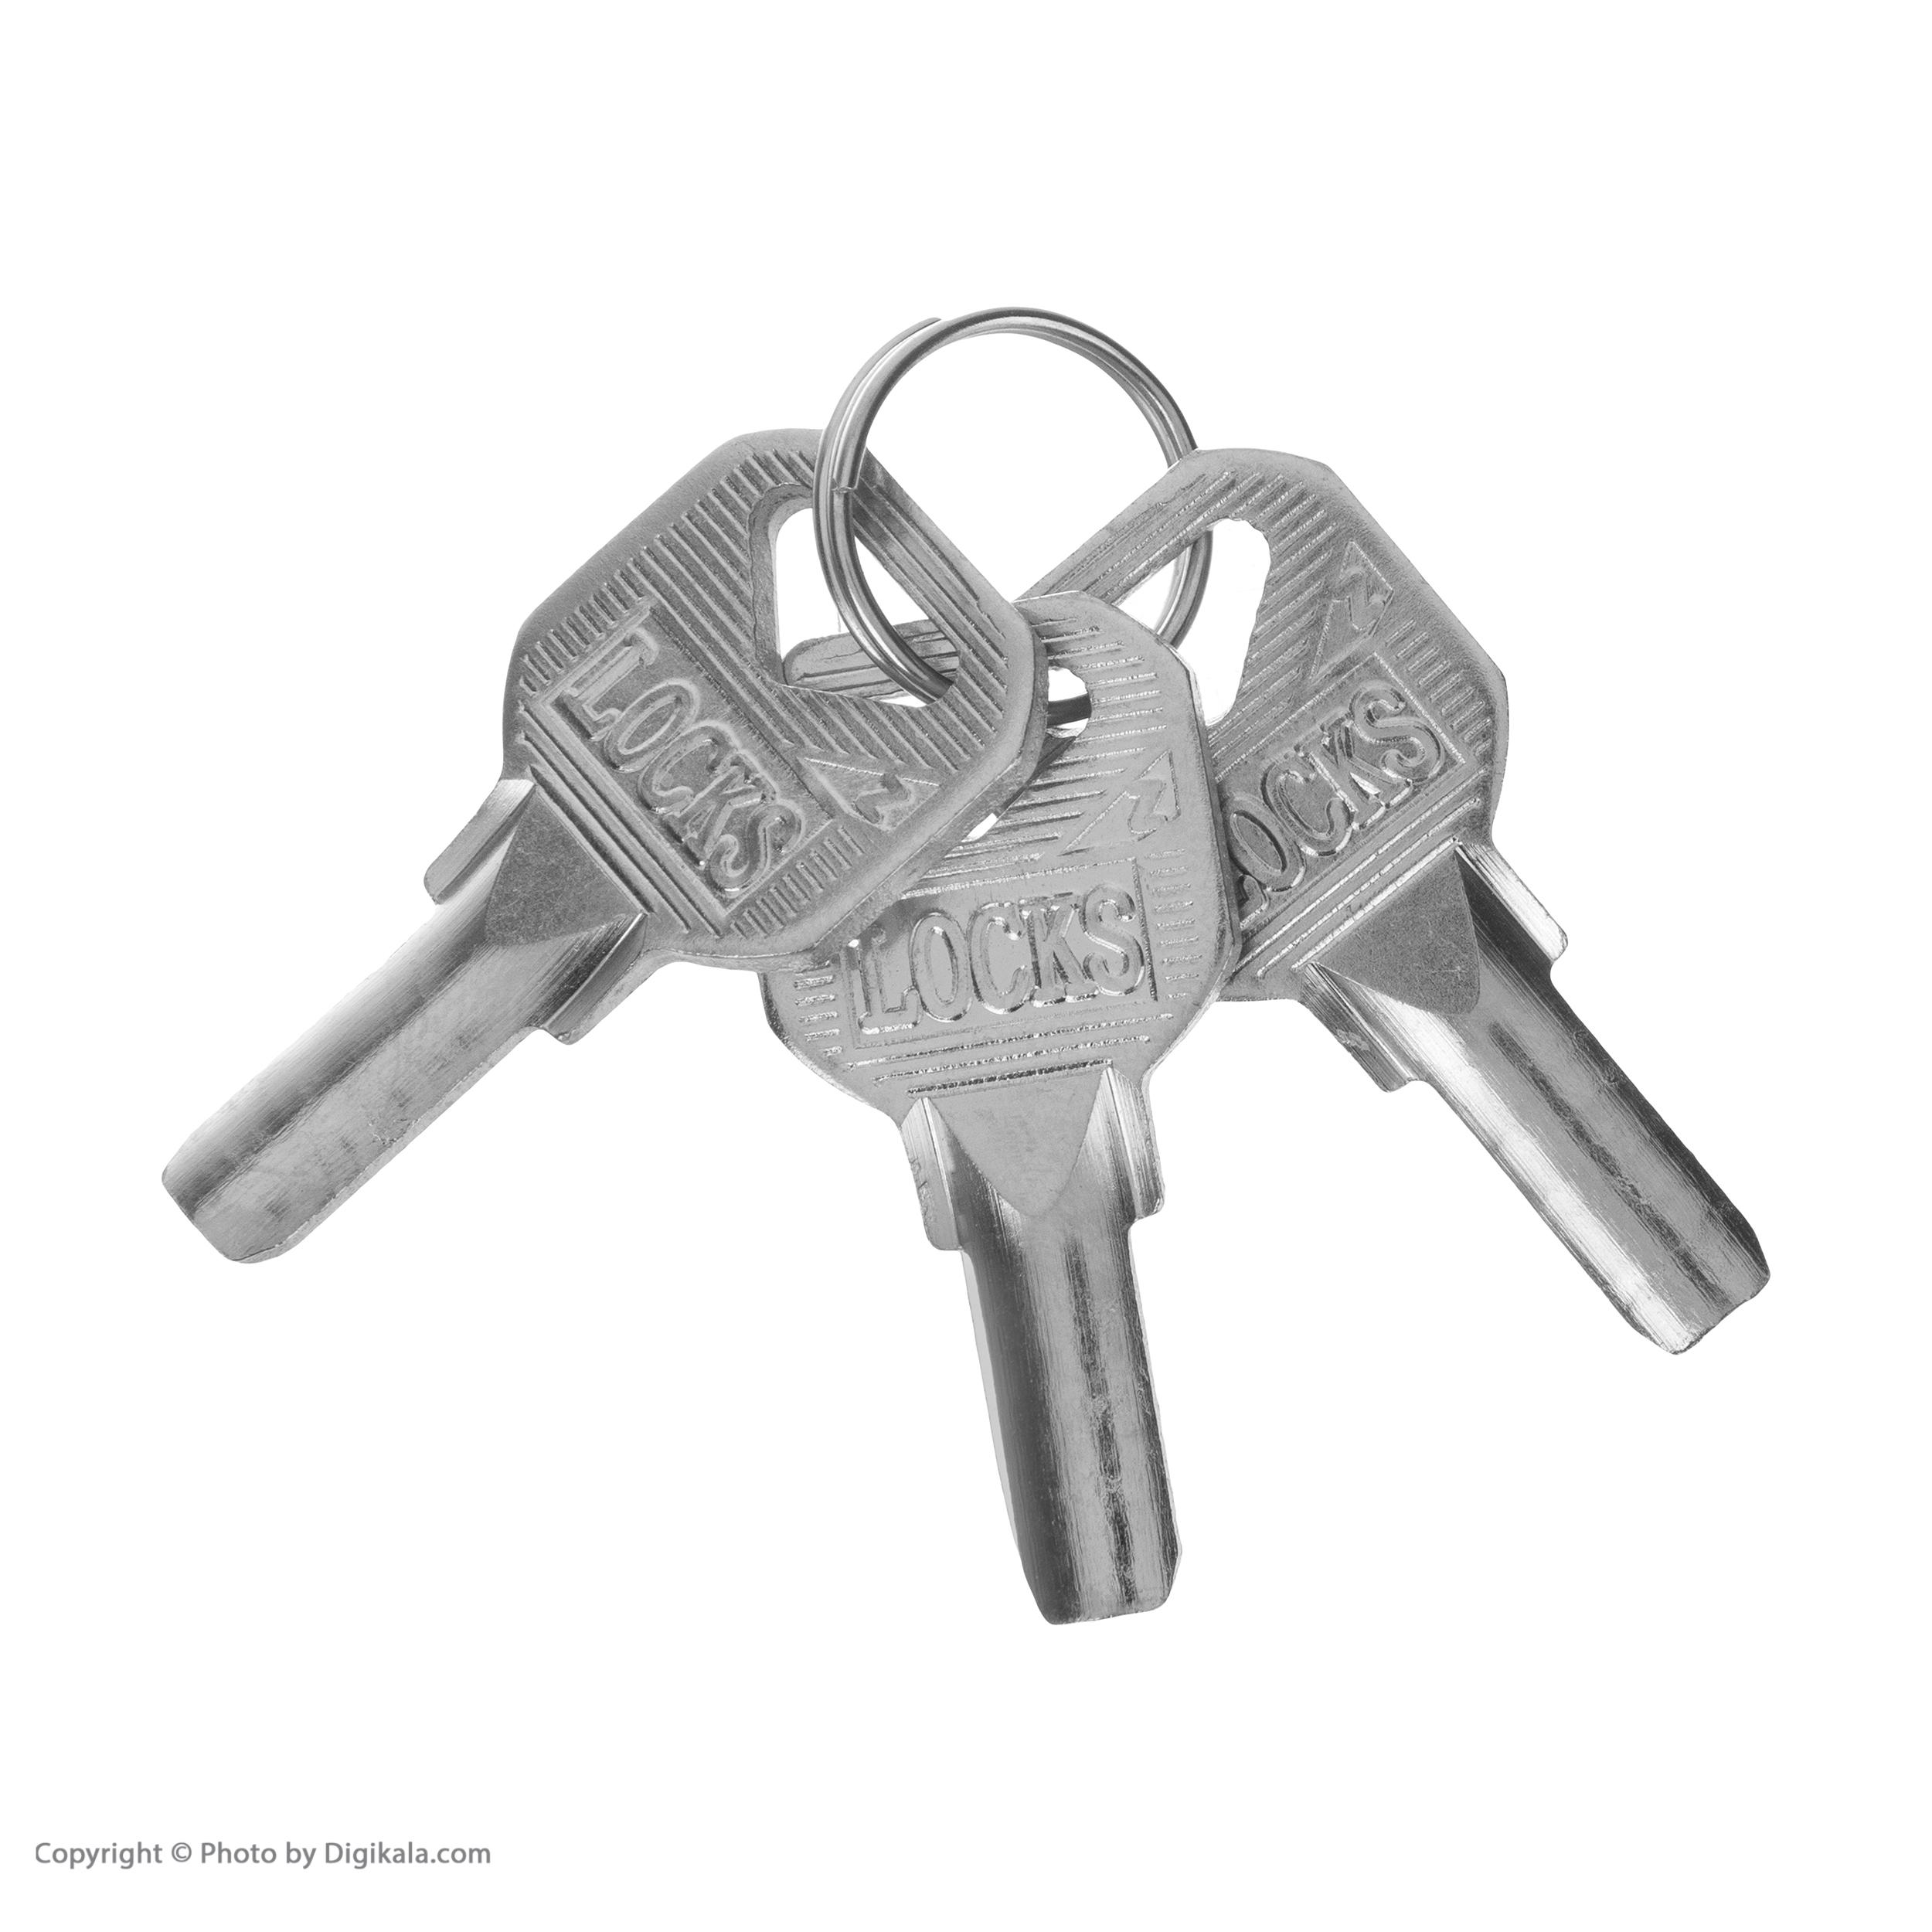 قفل پدال صنایع نصر مدل K260 main 1 5